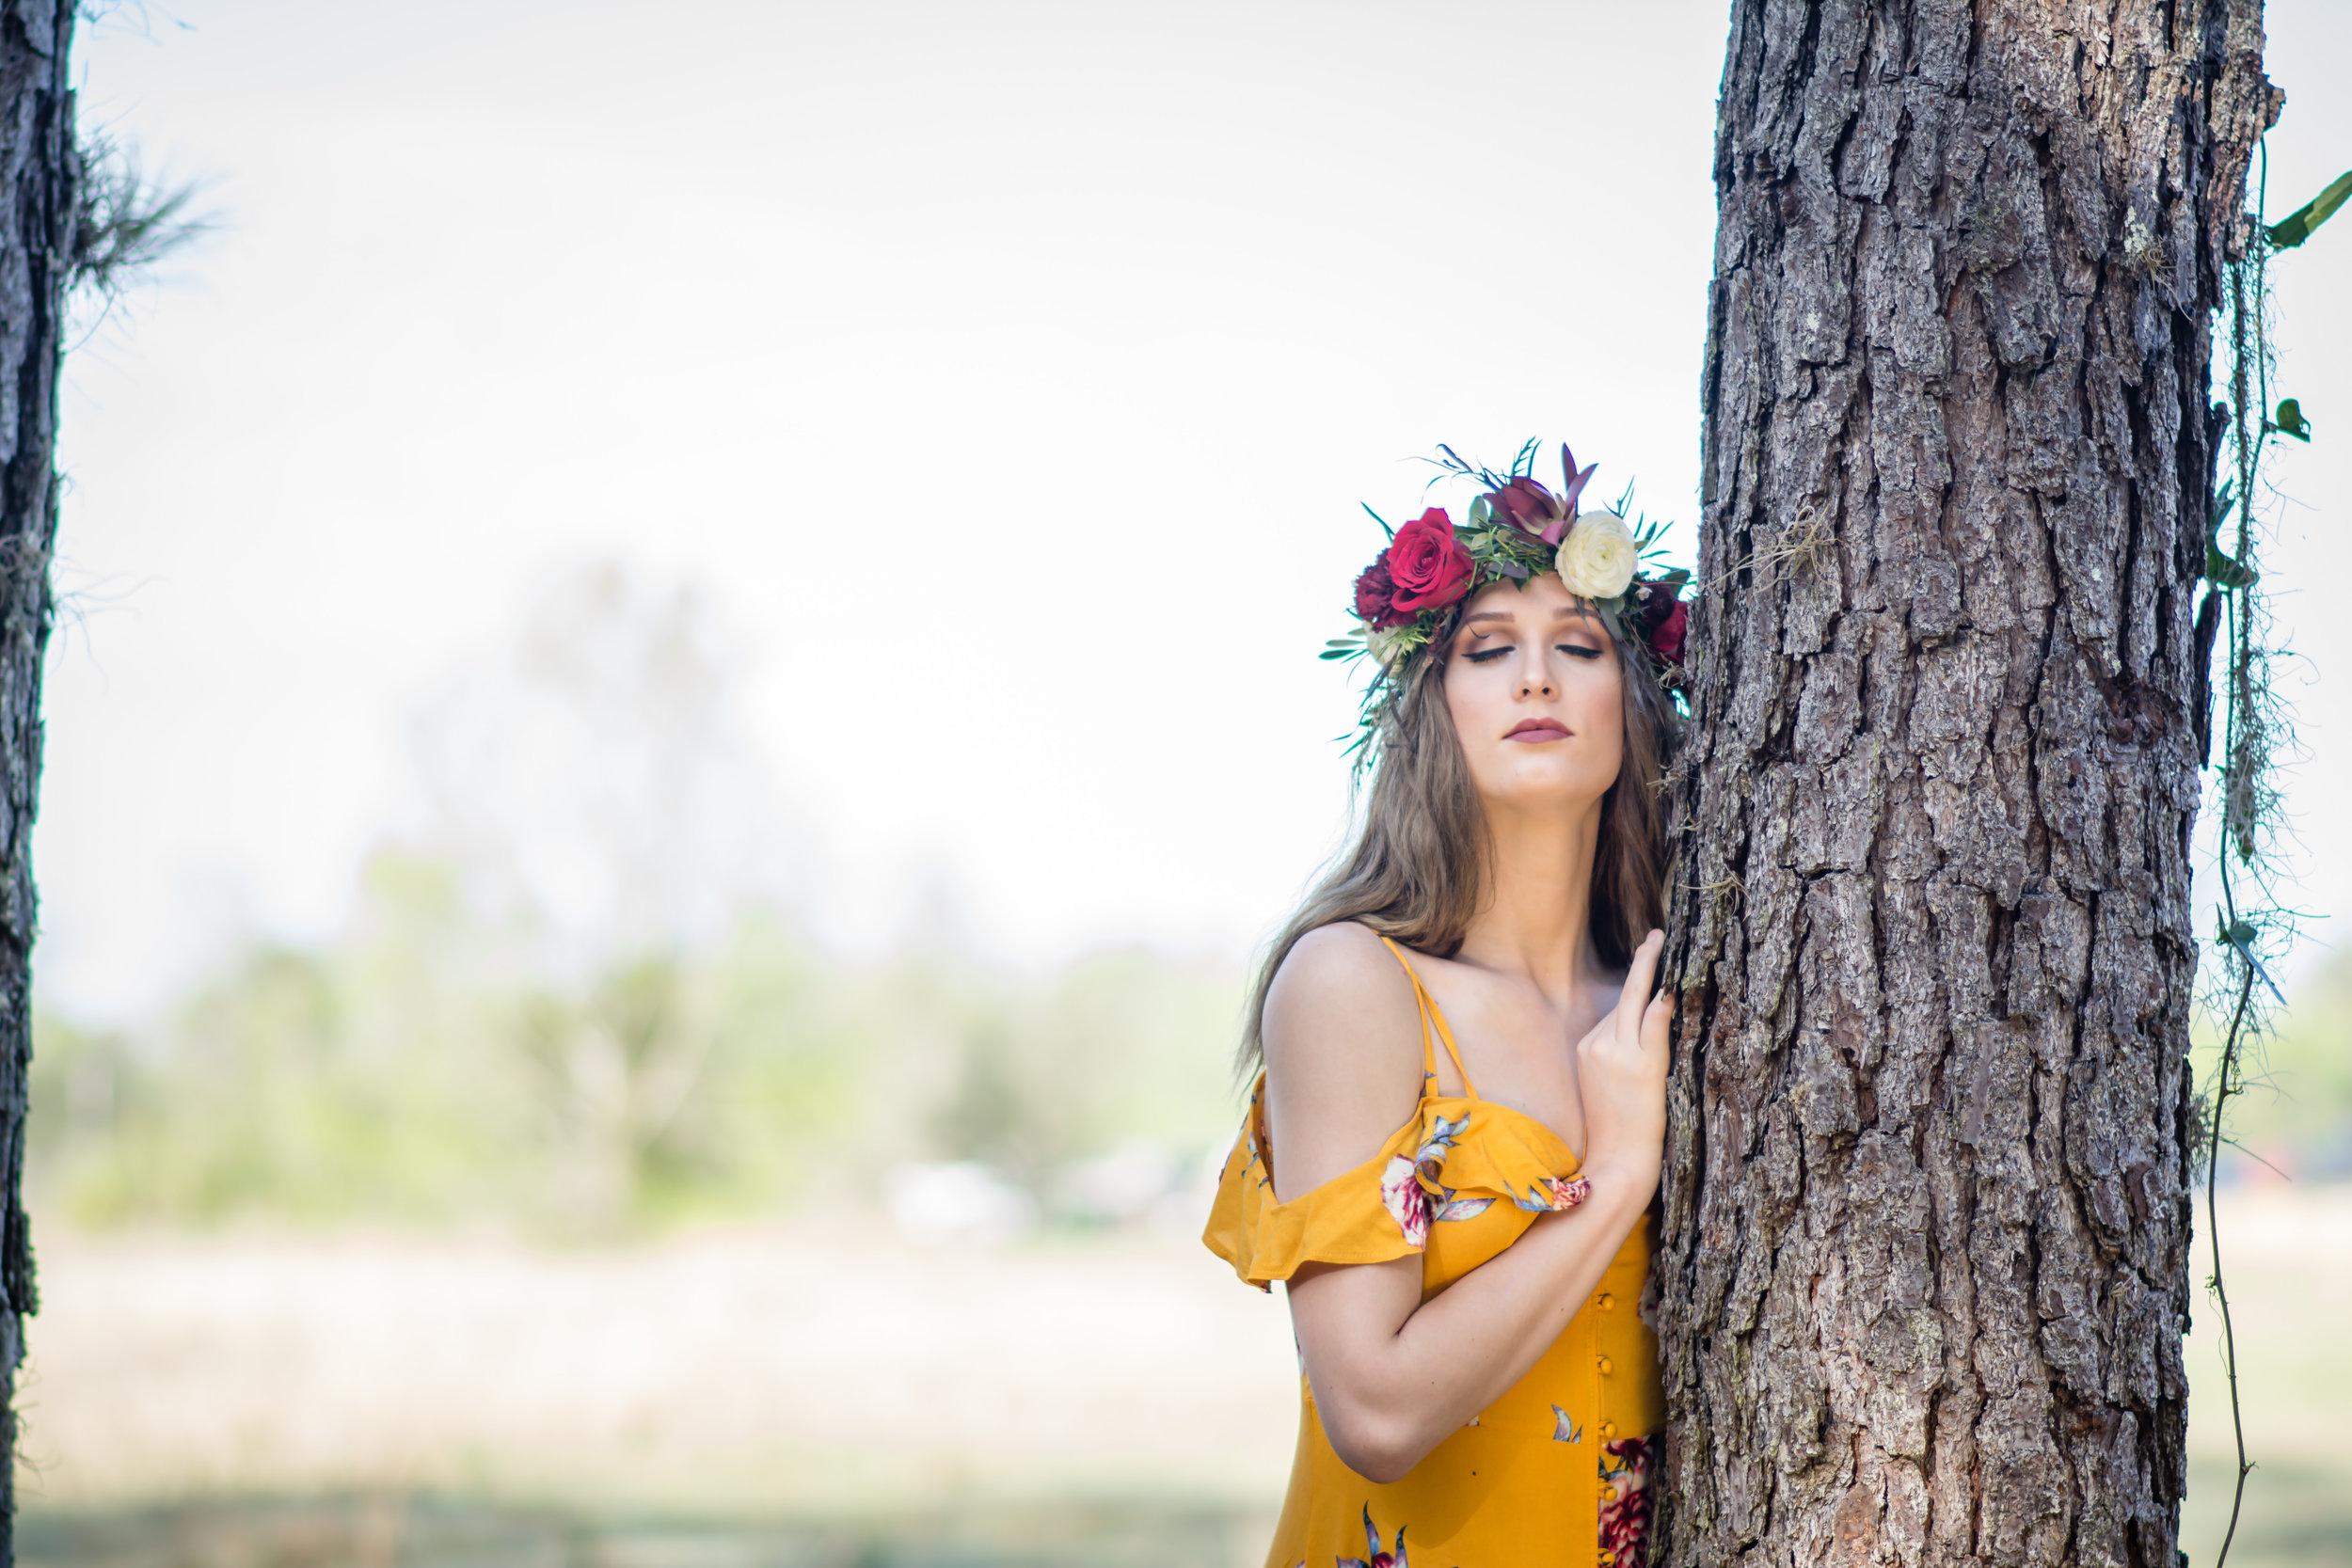 floral-headpiece-fashion-photoshoot-geneva-central-florida-photographer-yanitza-ninett-10.jpg